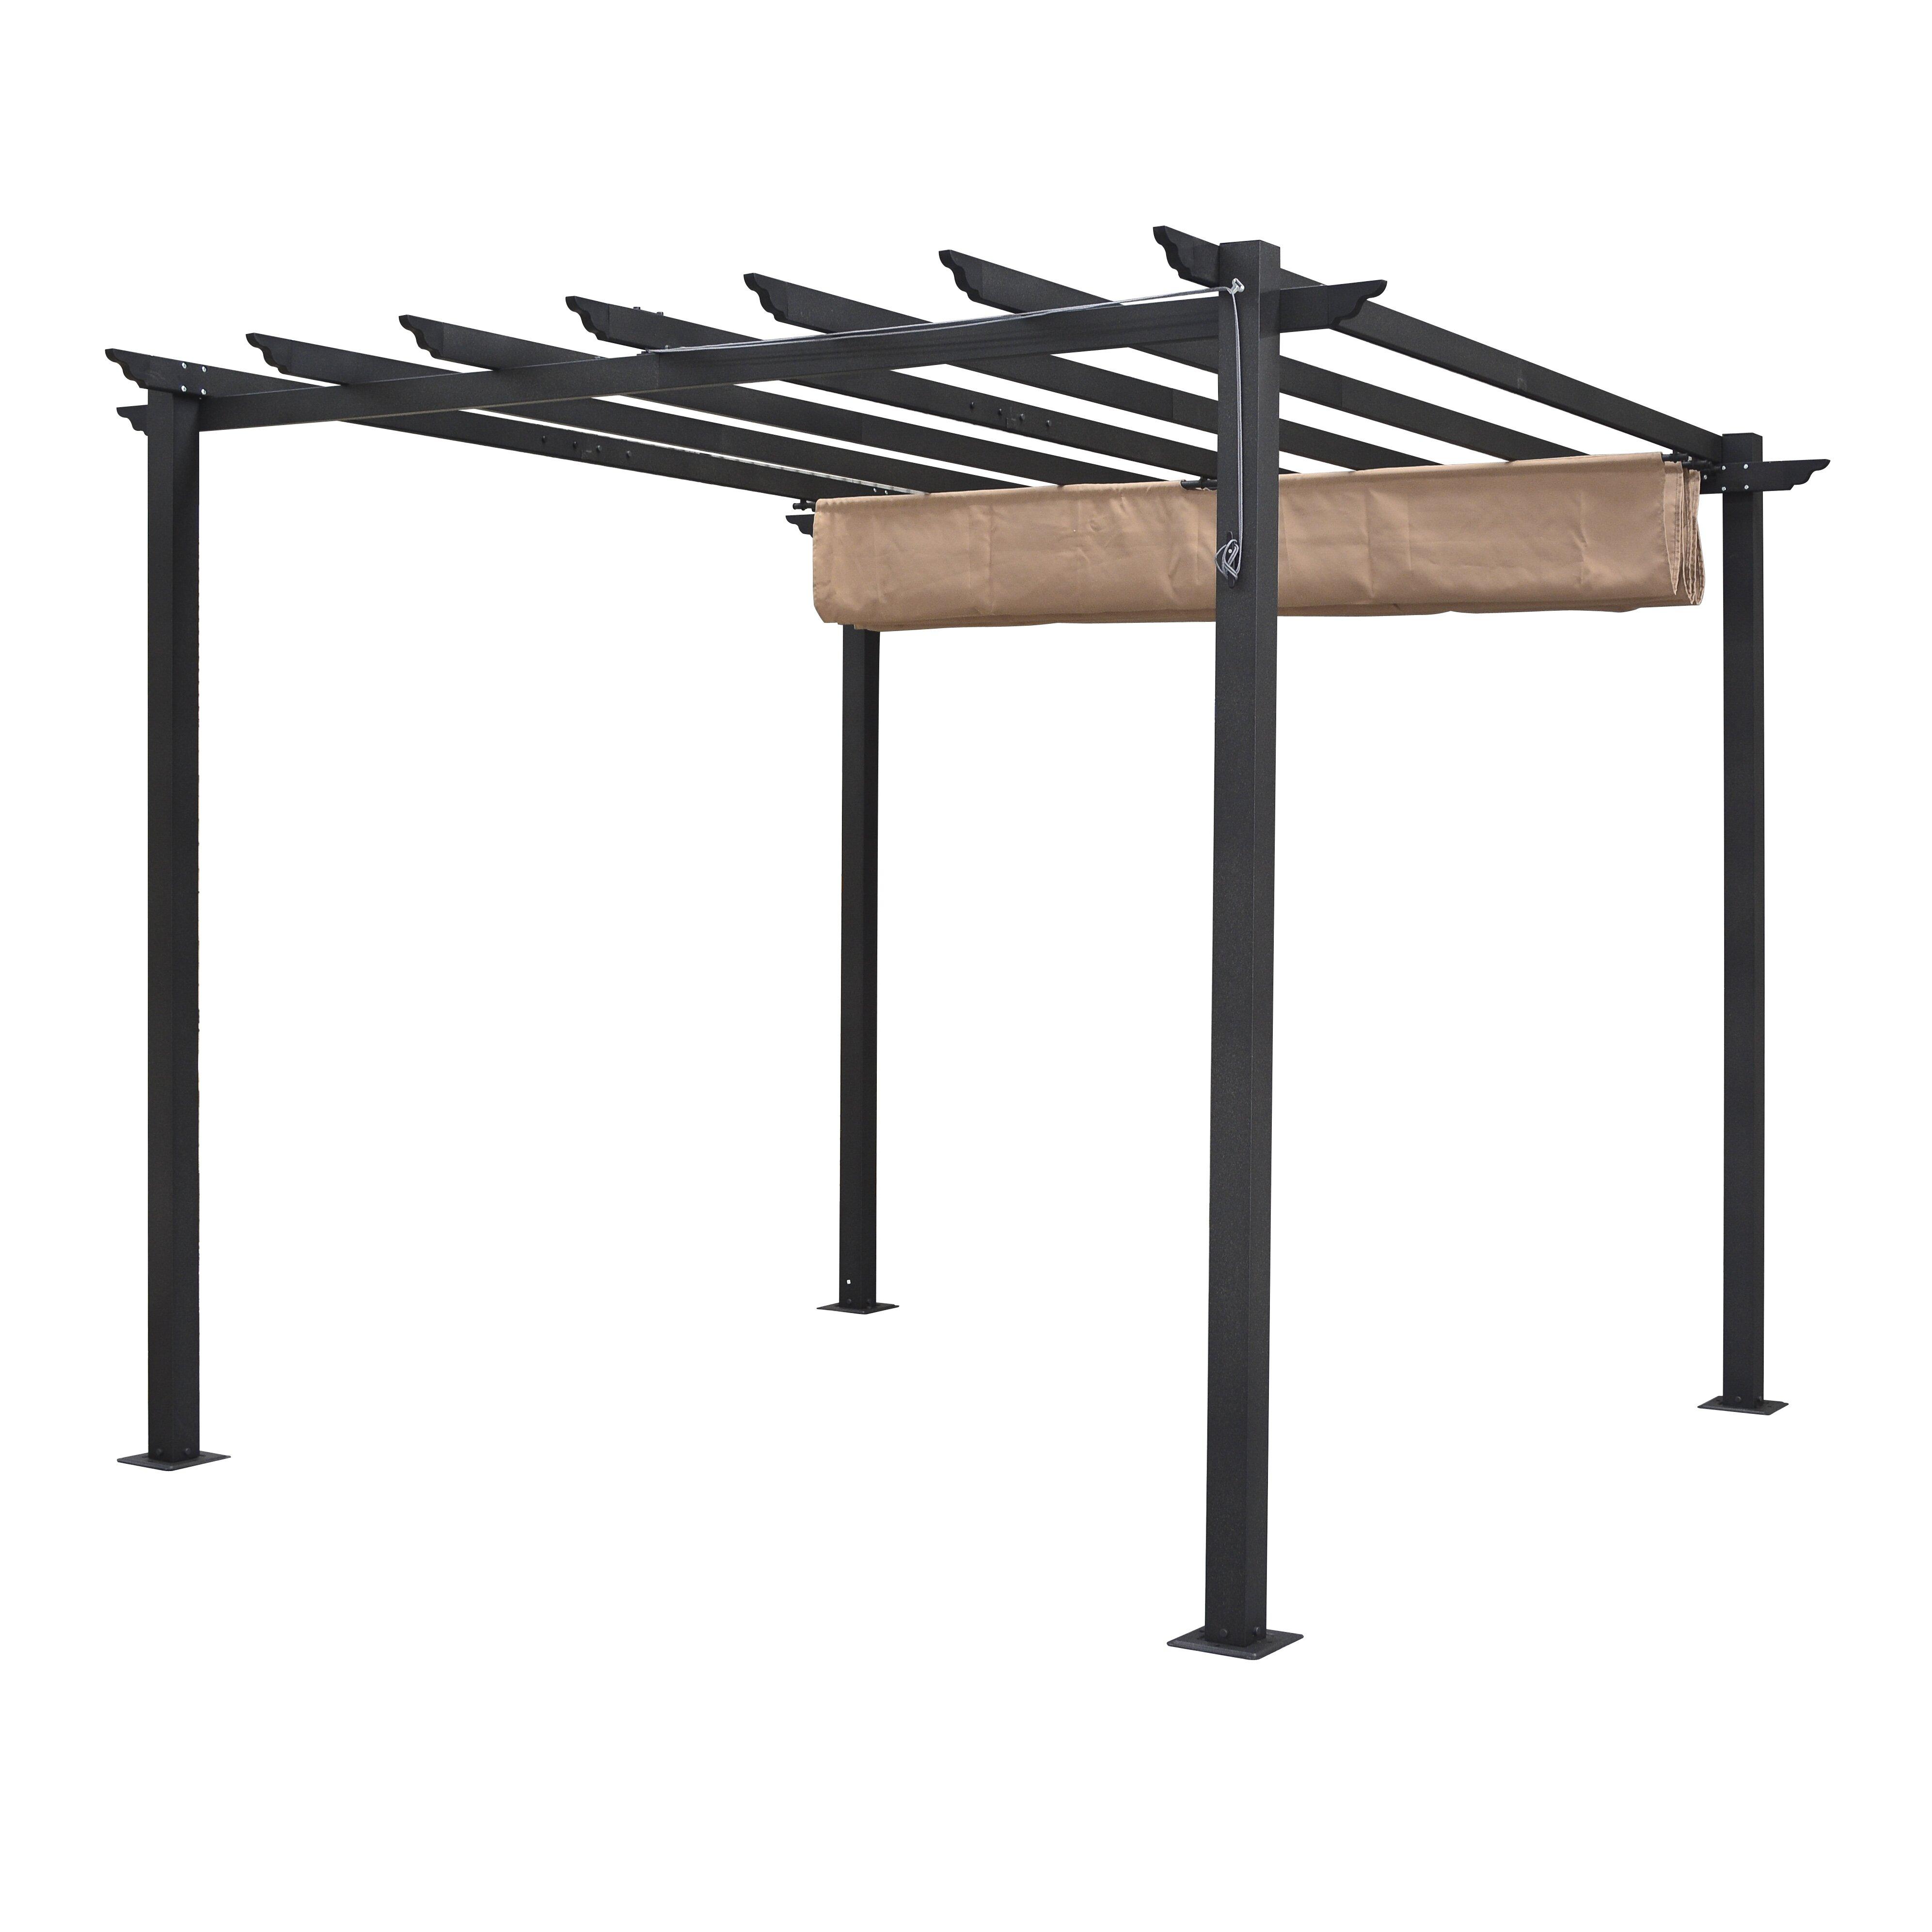 rowlinson latina 10 ft h x 8 ft w x 8 ft d pergola. Black Bedroom Furniture Sets. Home Design Ideas